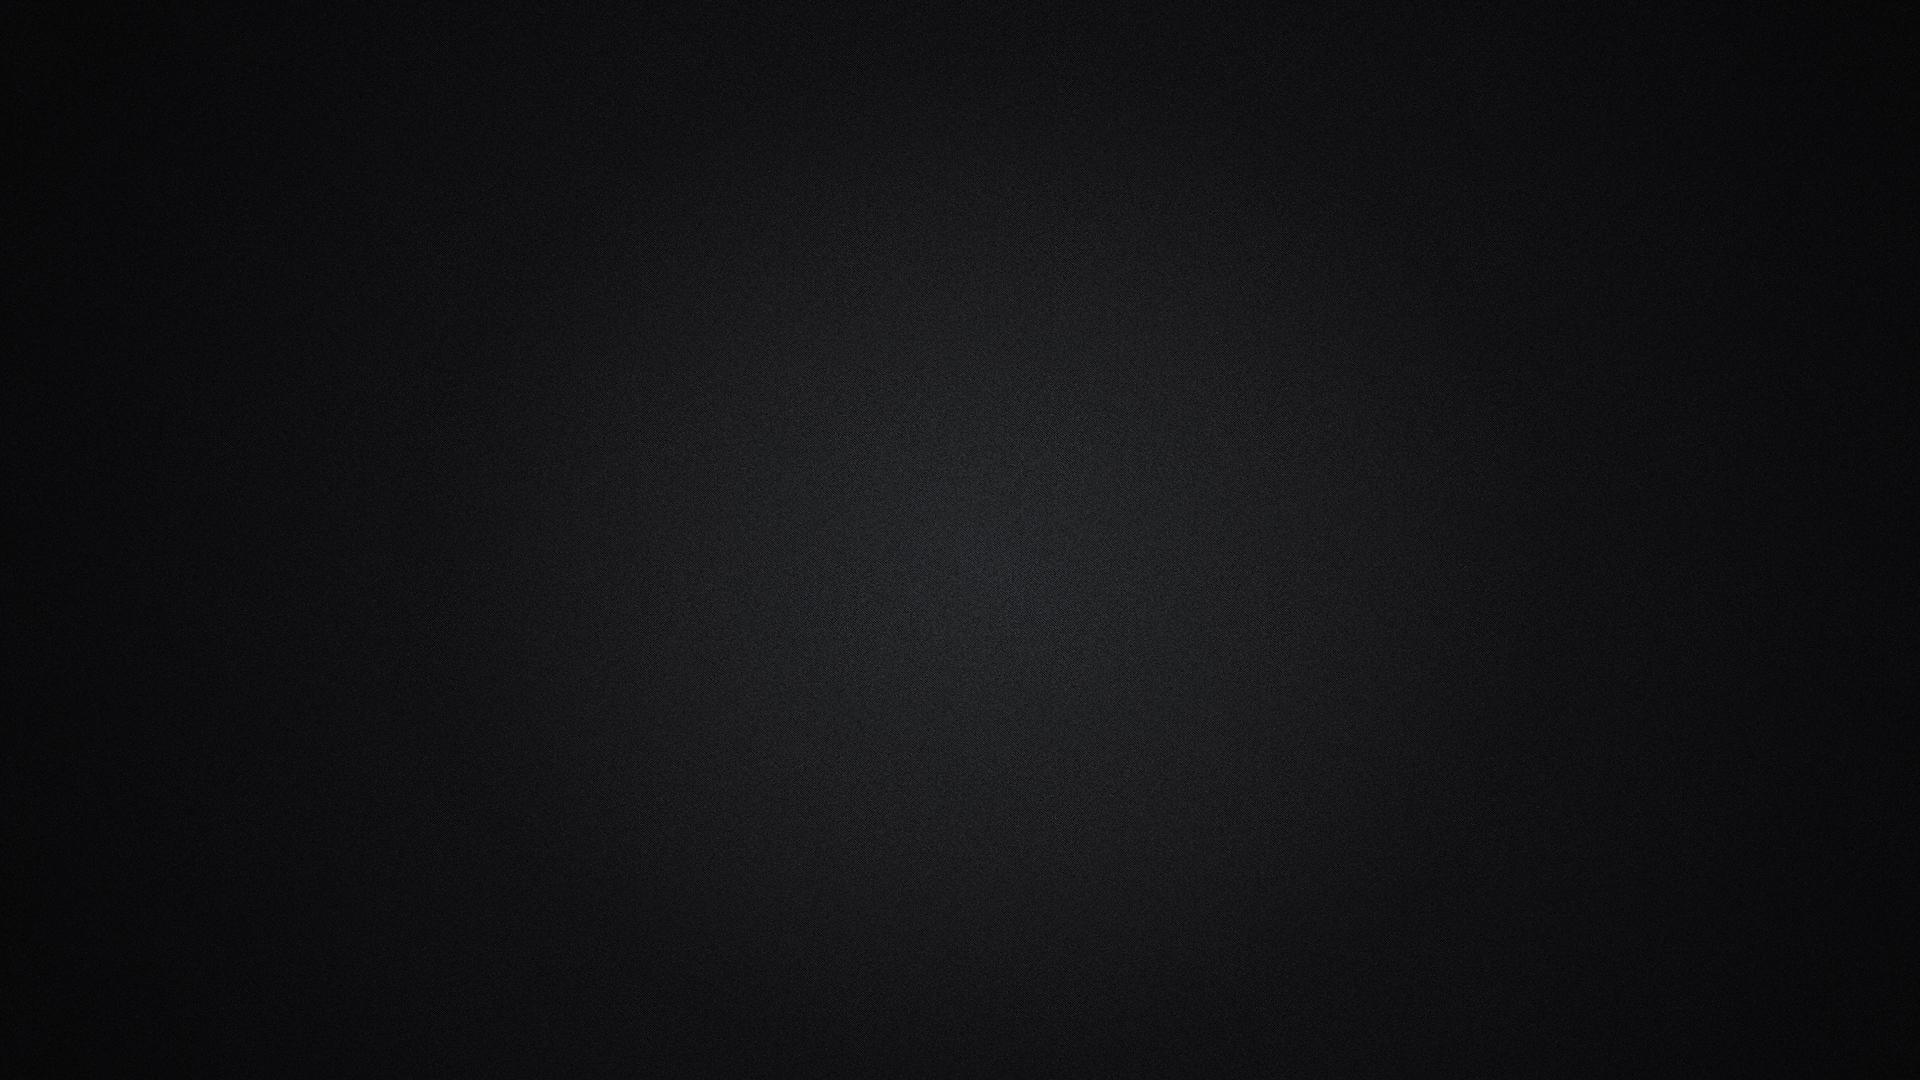 Simply Dark Windows 10 Wallpaper Dark Hd 1920x1080 Wallpapers